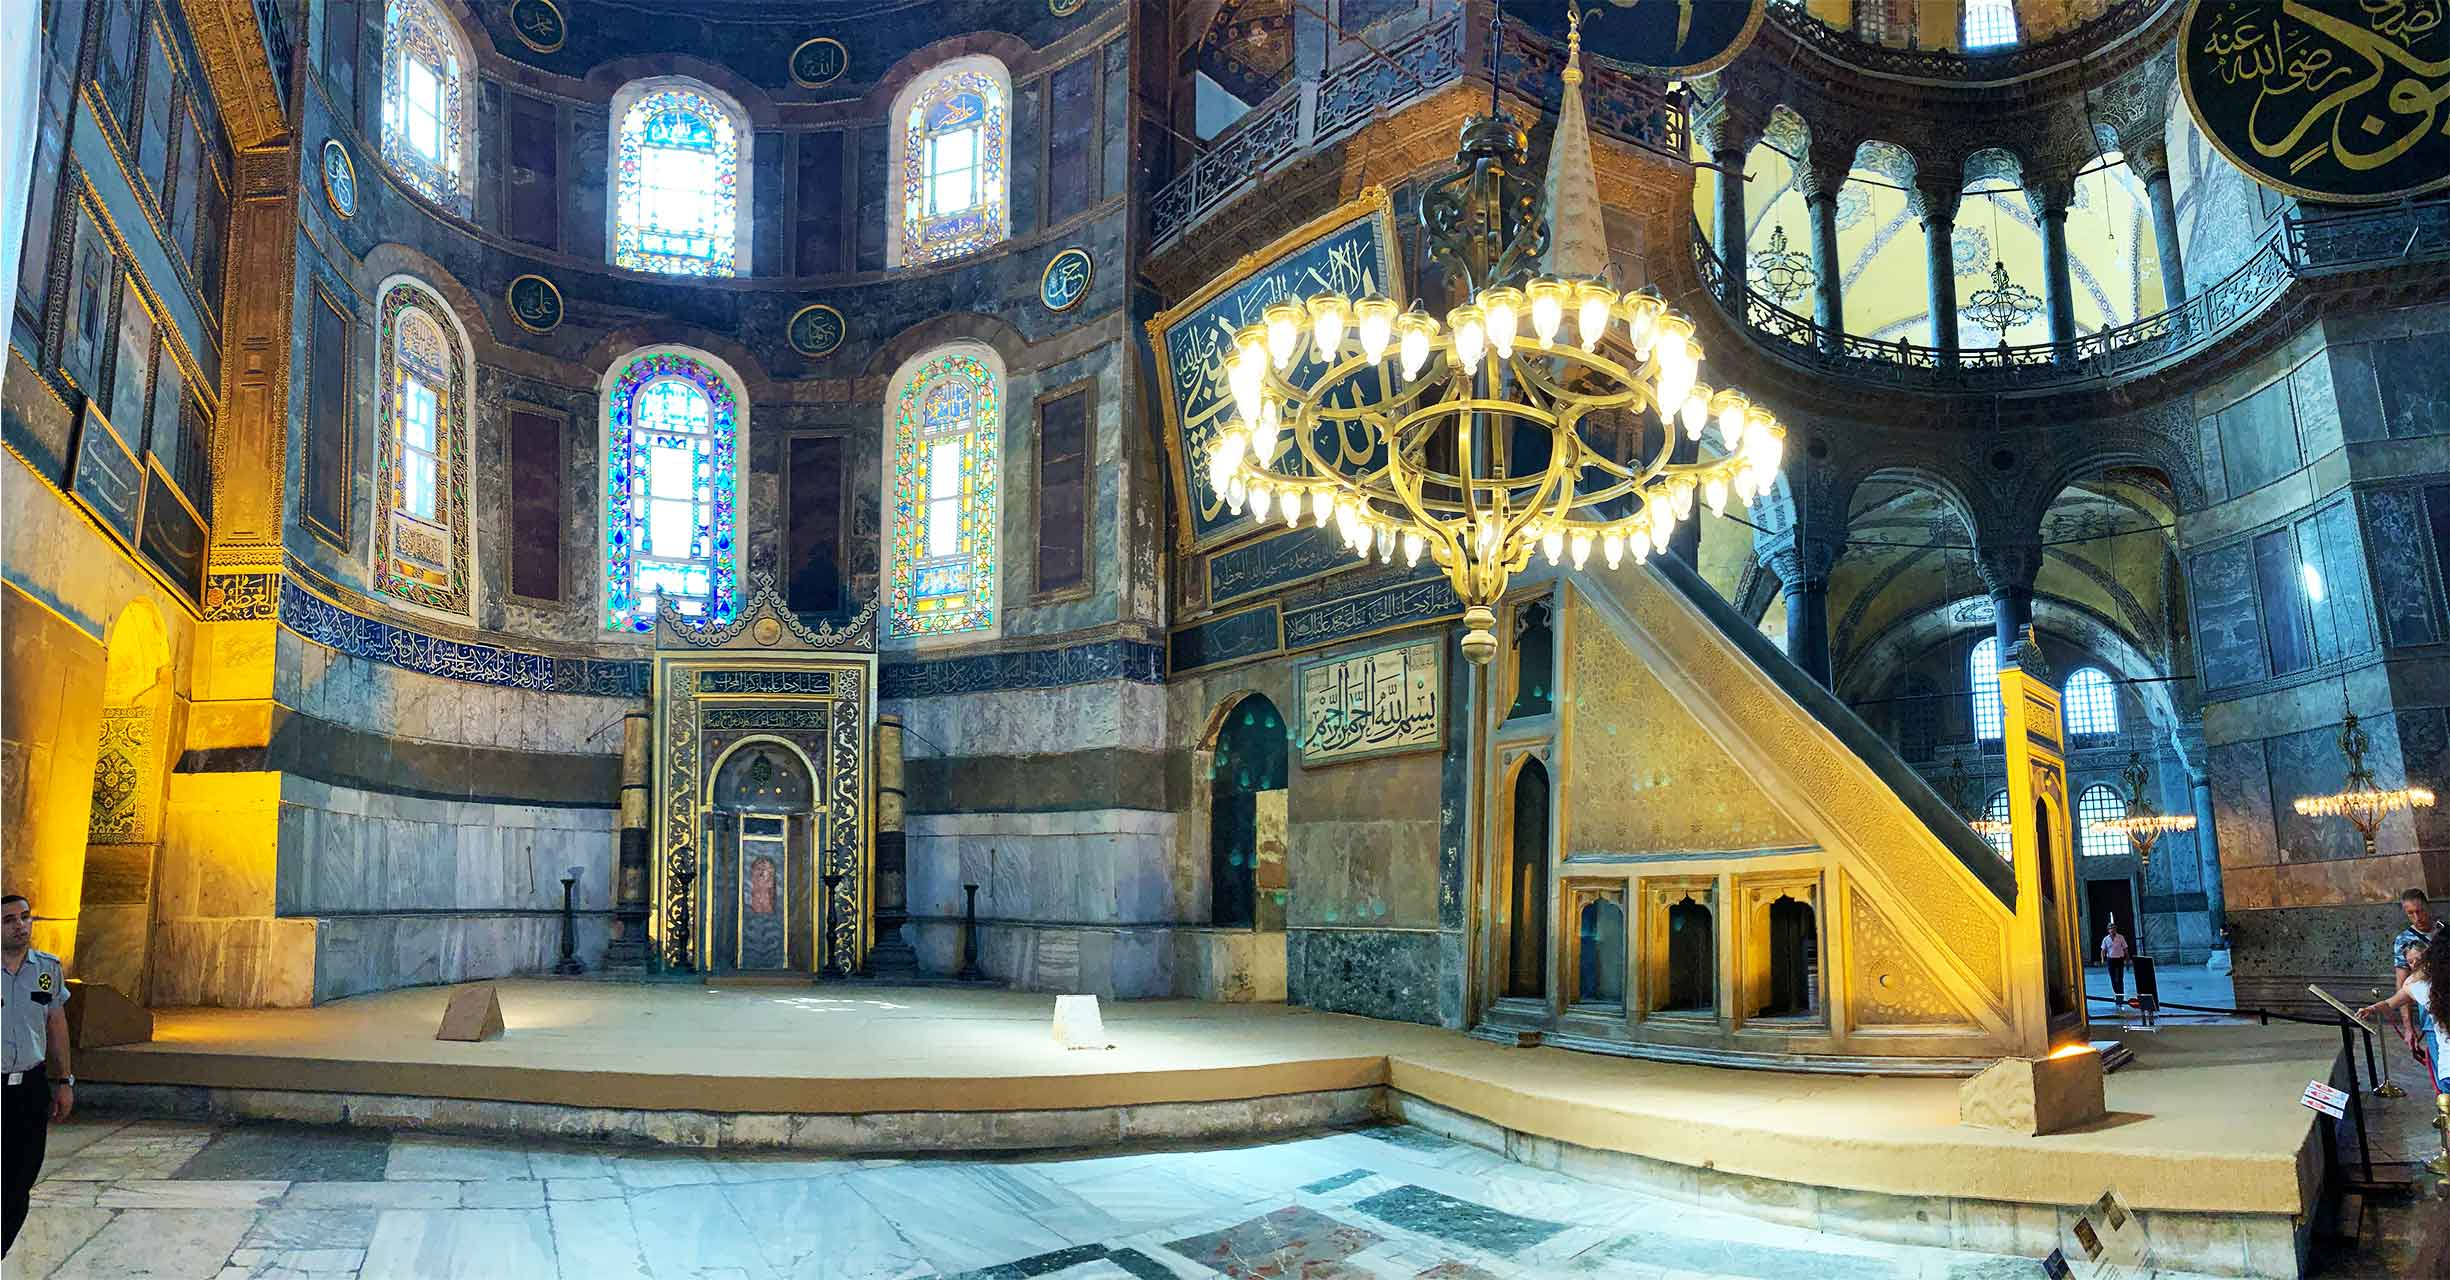 Hagia Sophia | Ayasofya Museum Mihrab alter and Minbar pulpit | Istanbul Turkey | 2019 Photo Dr Steven Andrew Martin